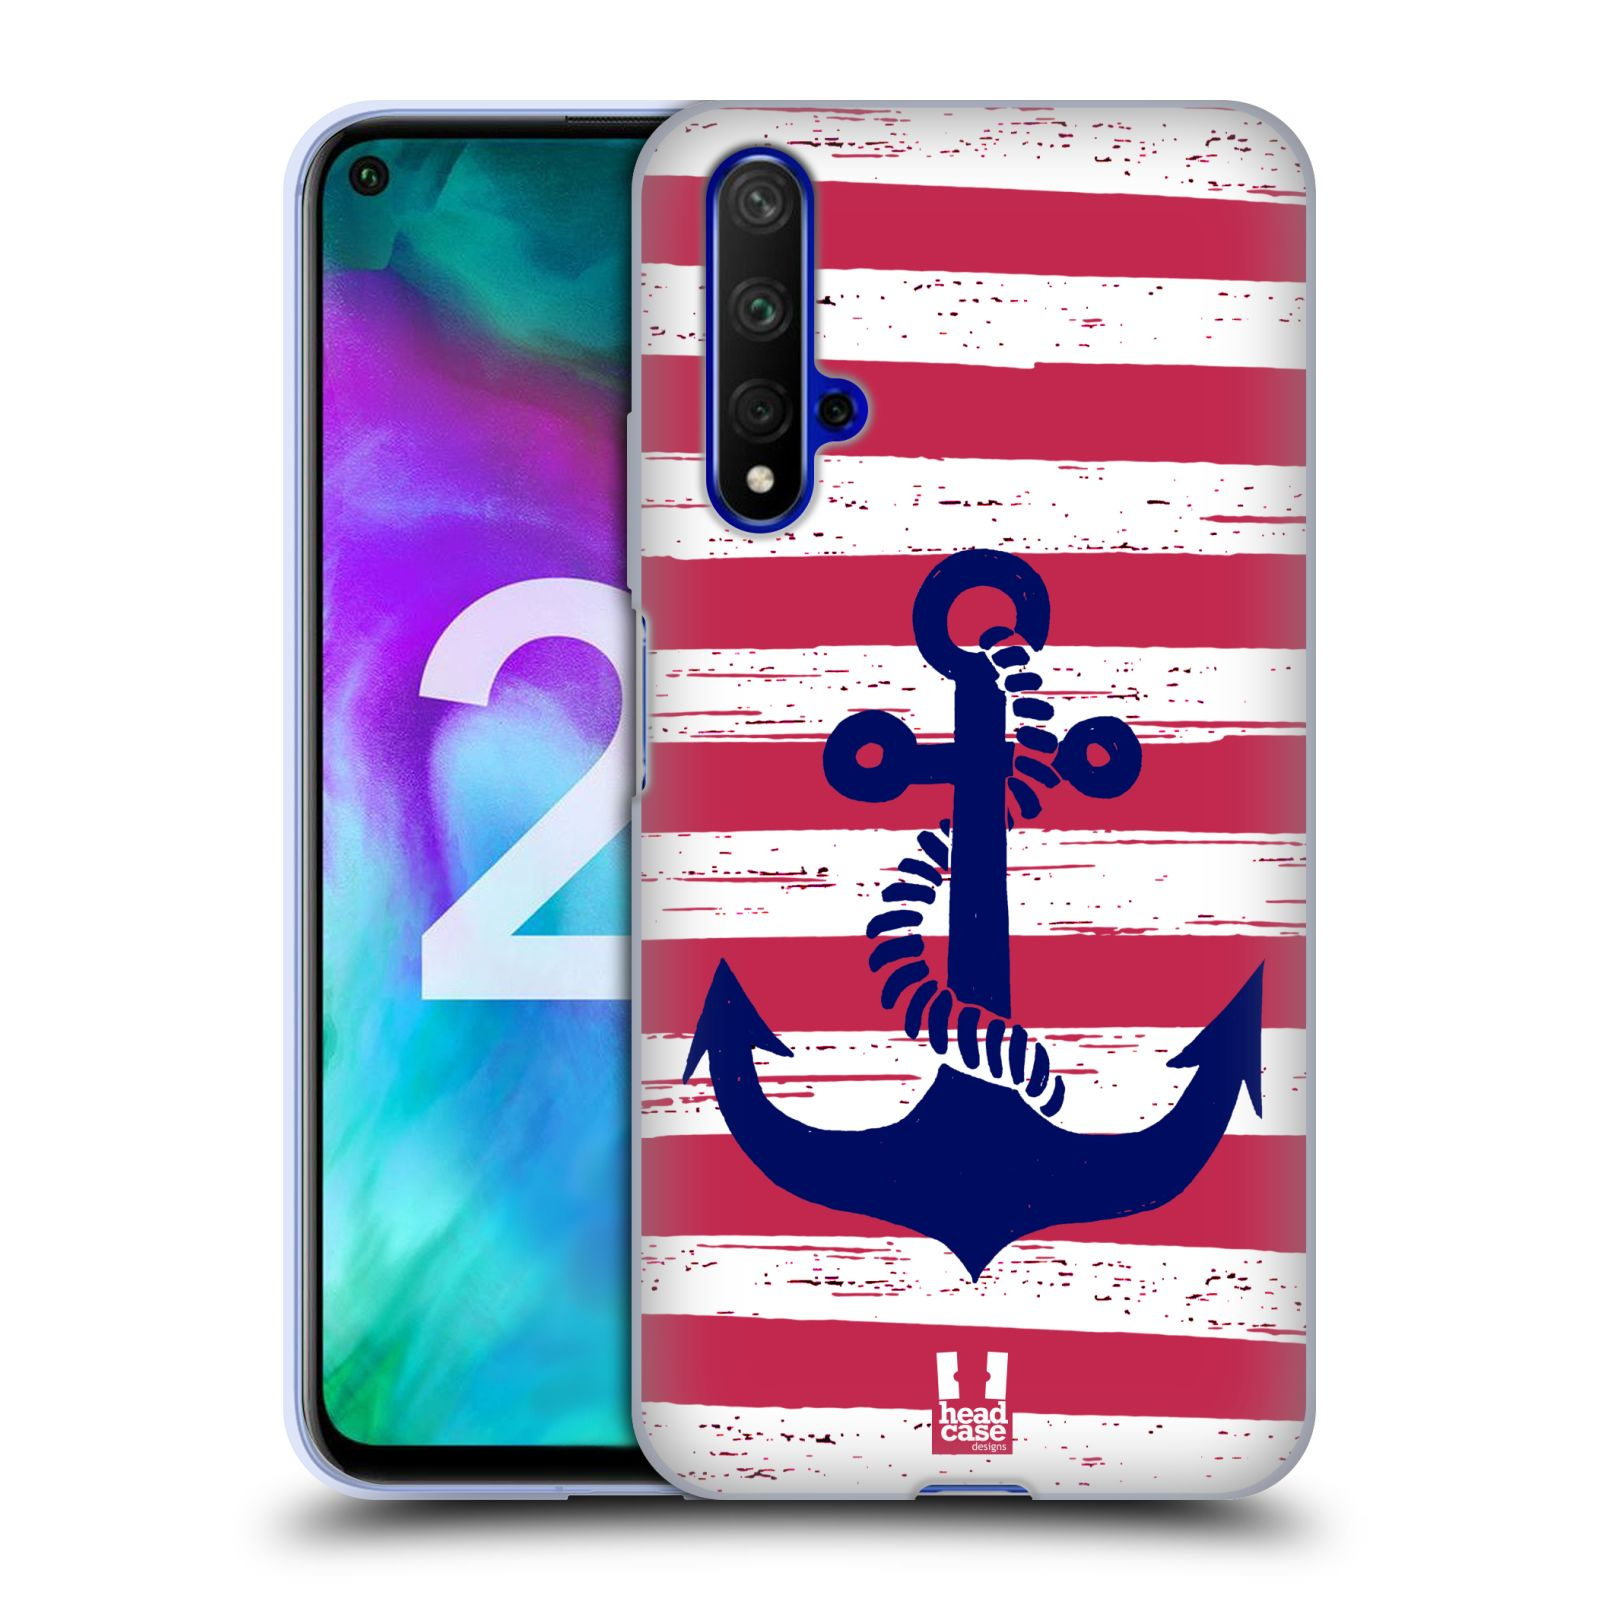 Silikonové pouzdro na mobil Honor 20 - Head Case - KOTVA S PRUHY